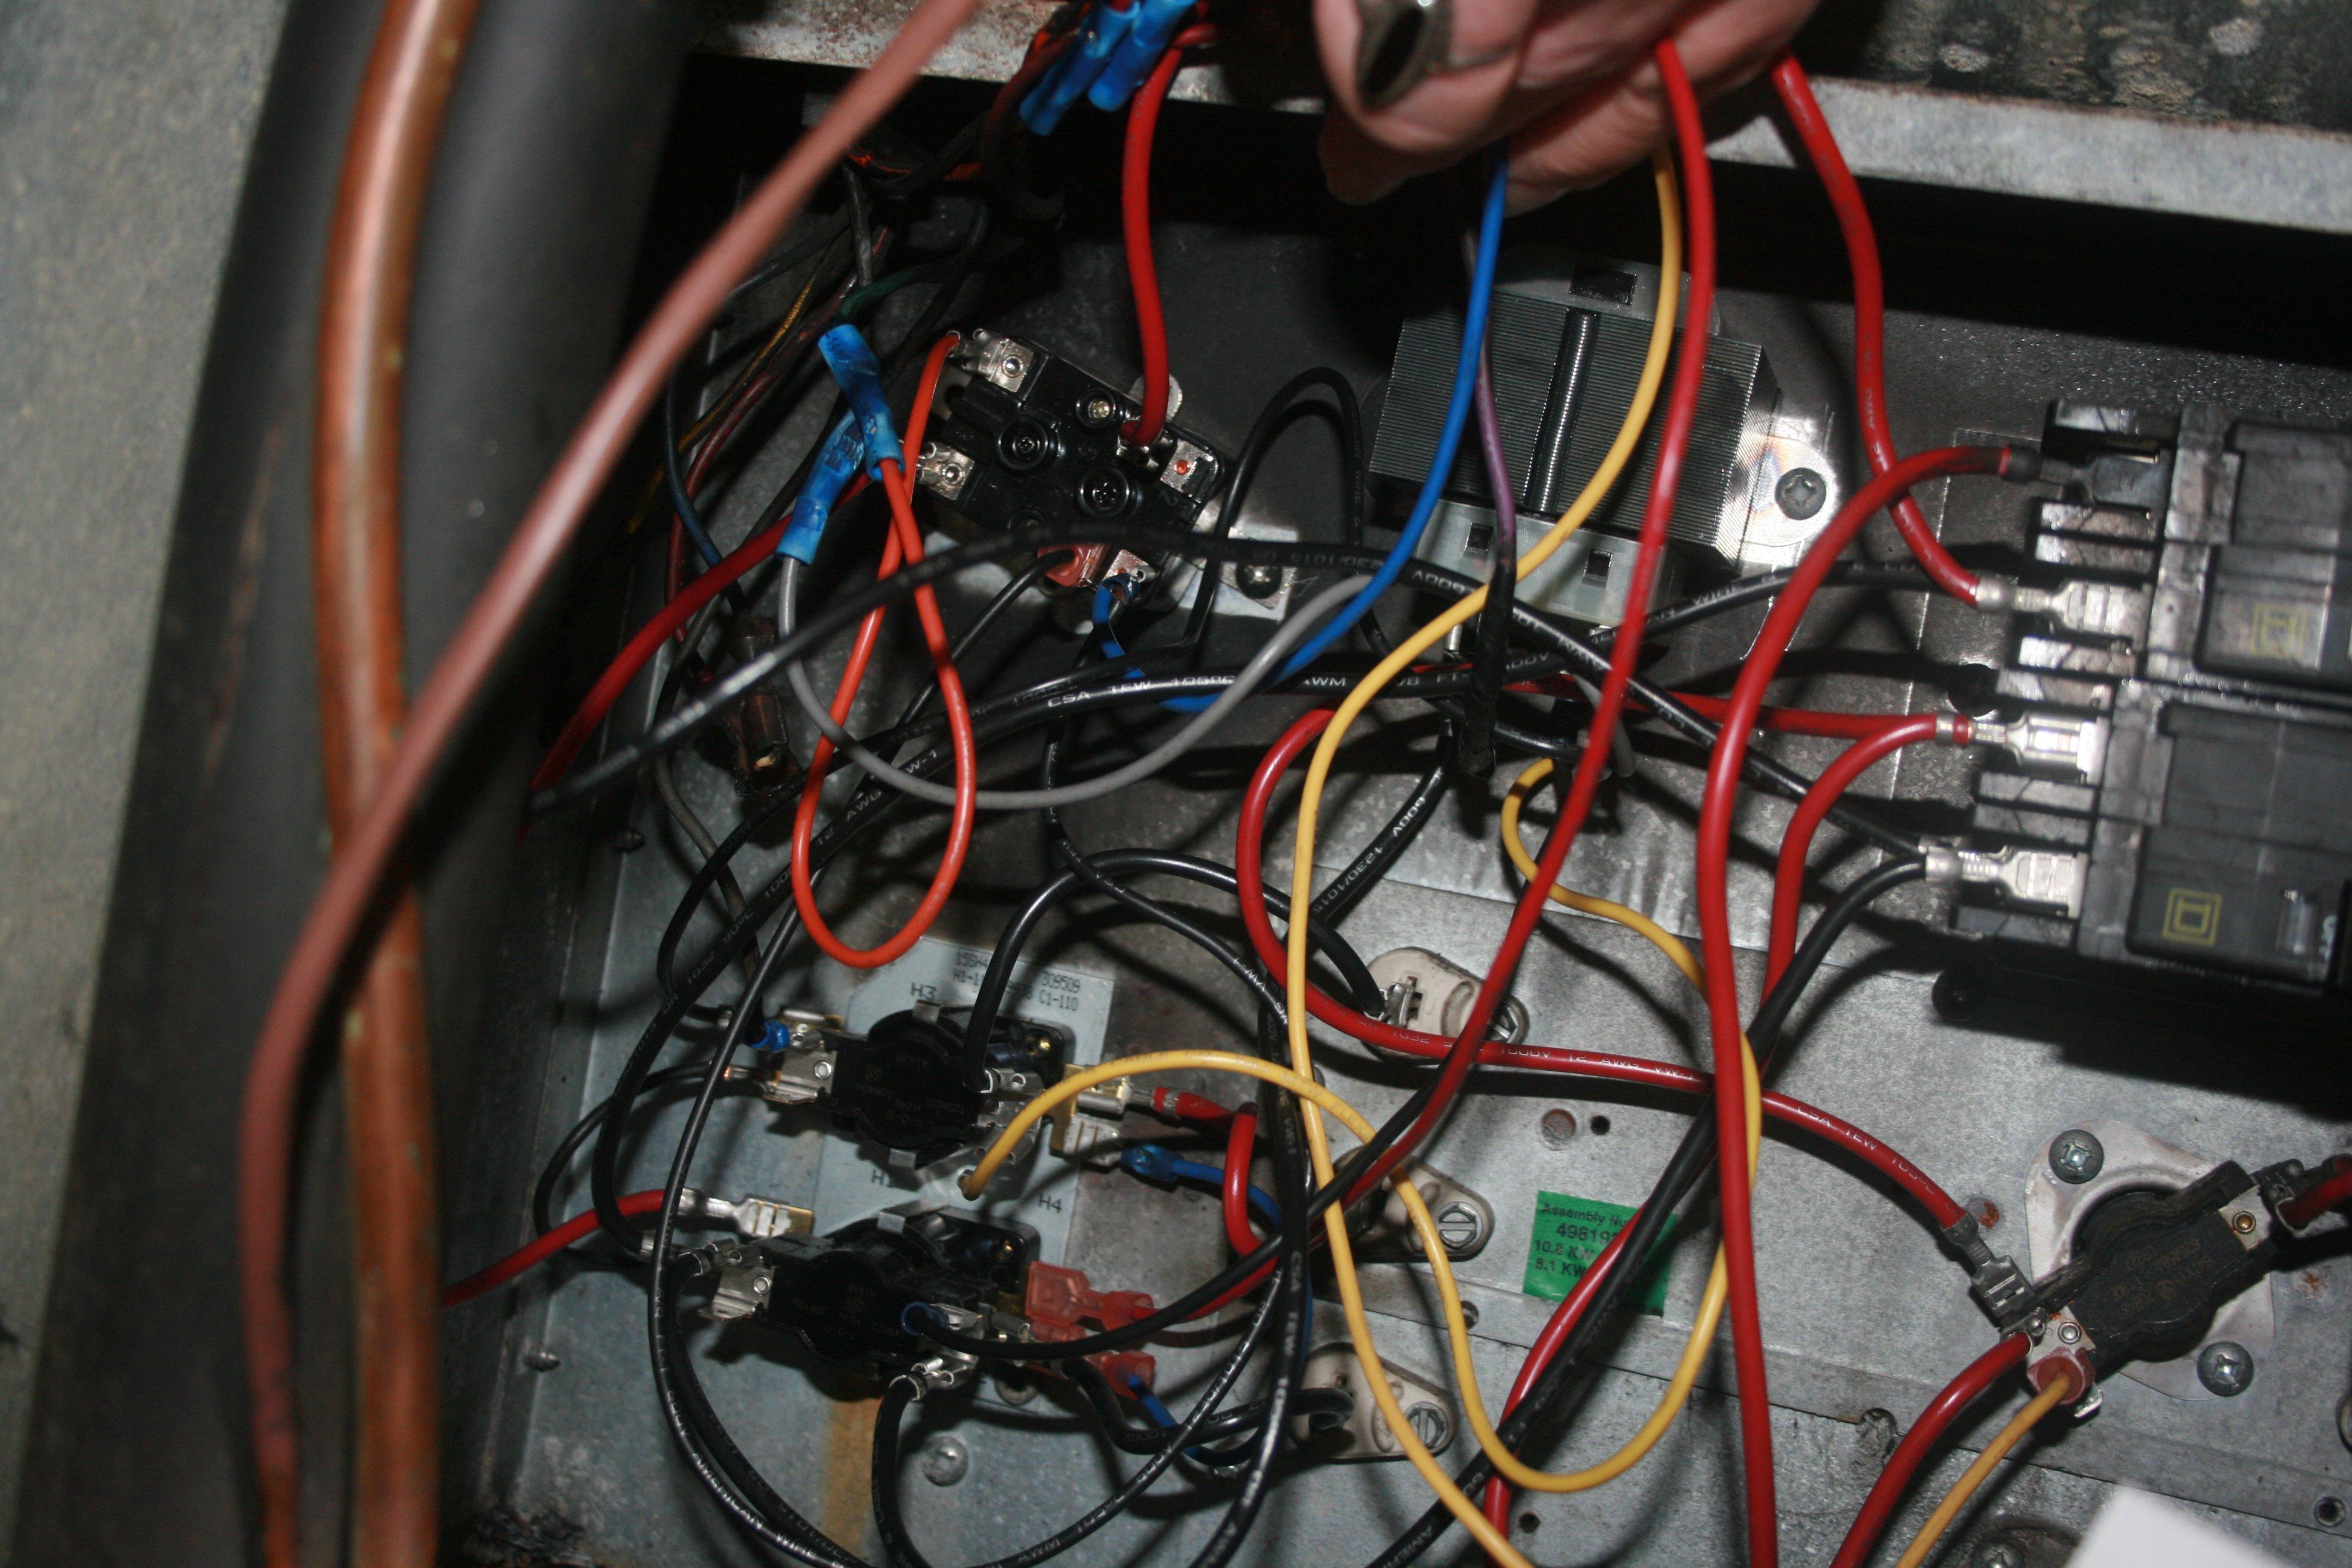 Nordyne E2Eb-017Ha Wiring Diagram from f01.justanswer.com